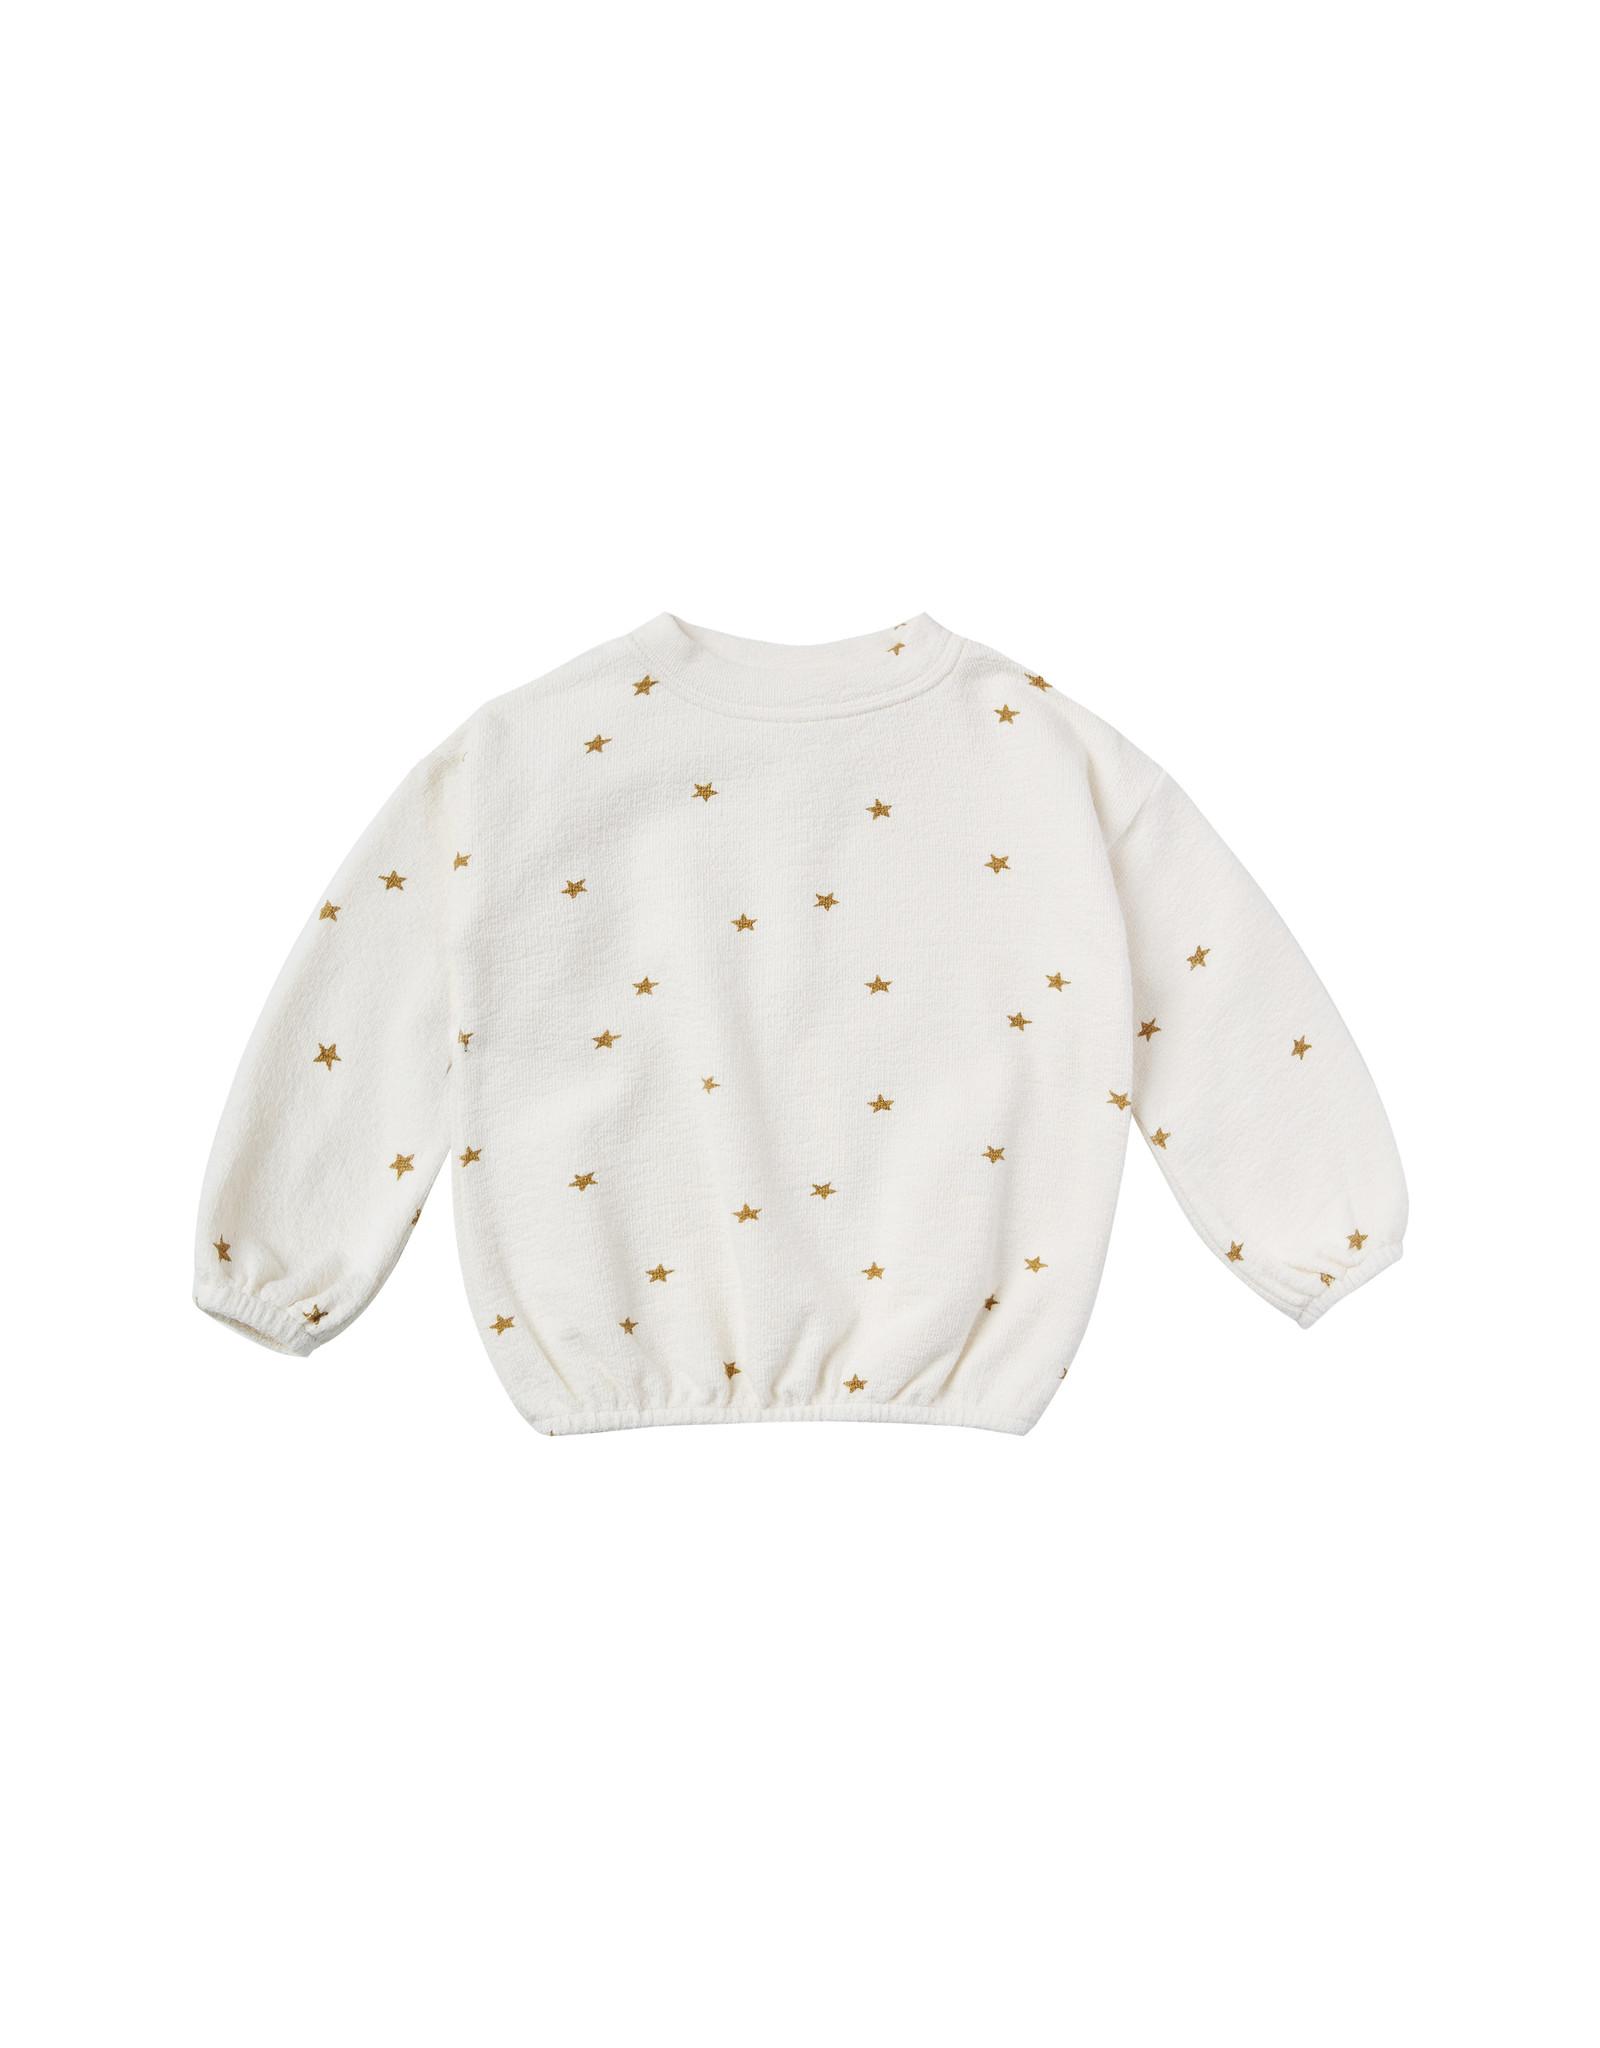 Rylee + Cru Star Slouchy Pullover